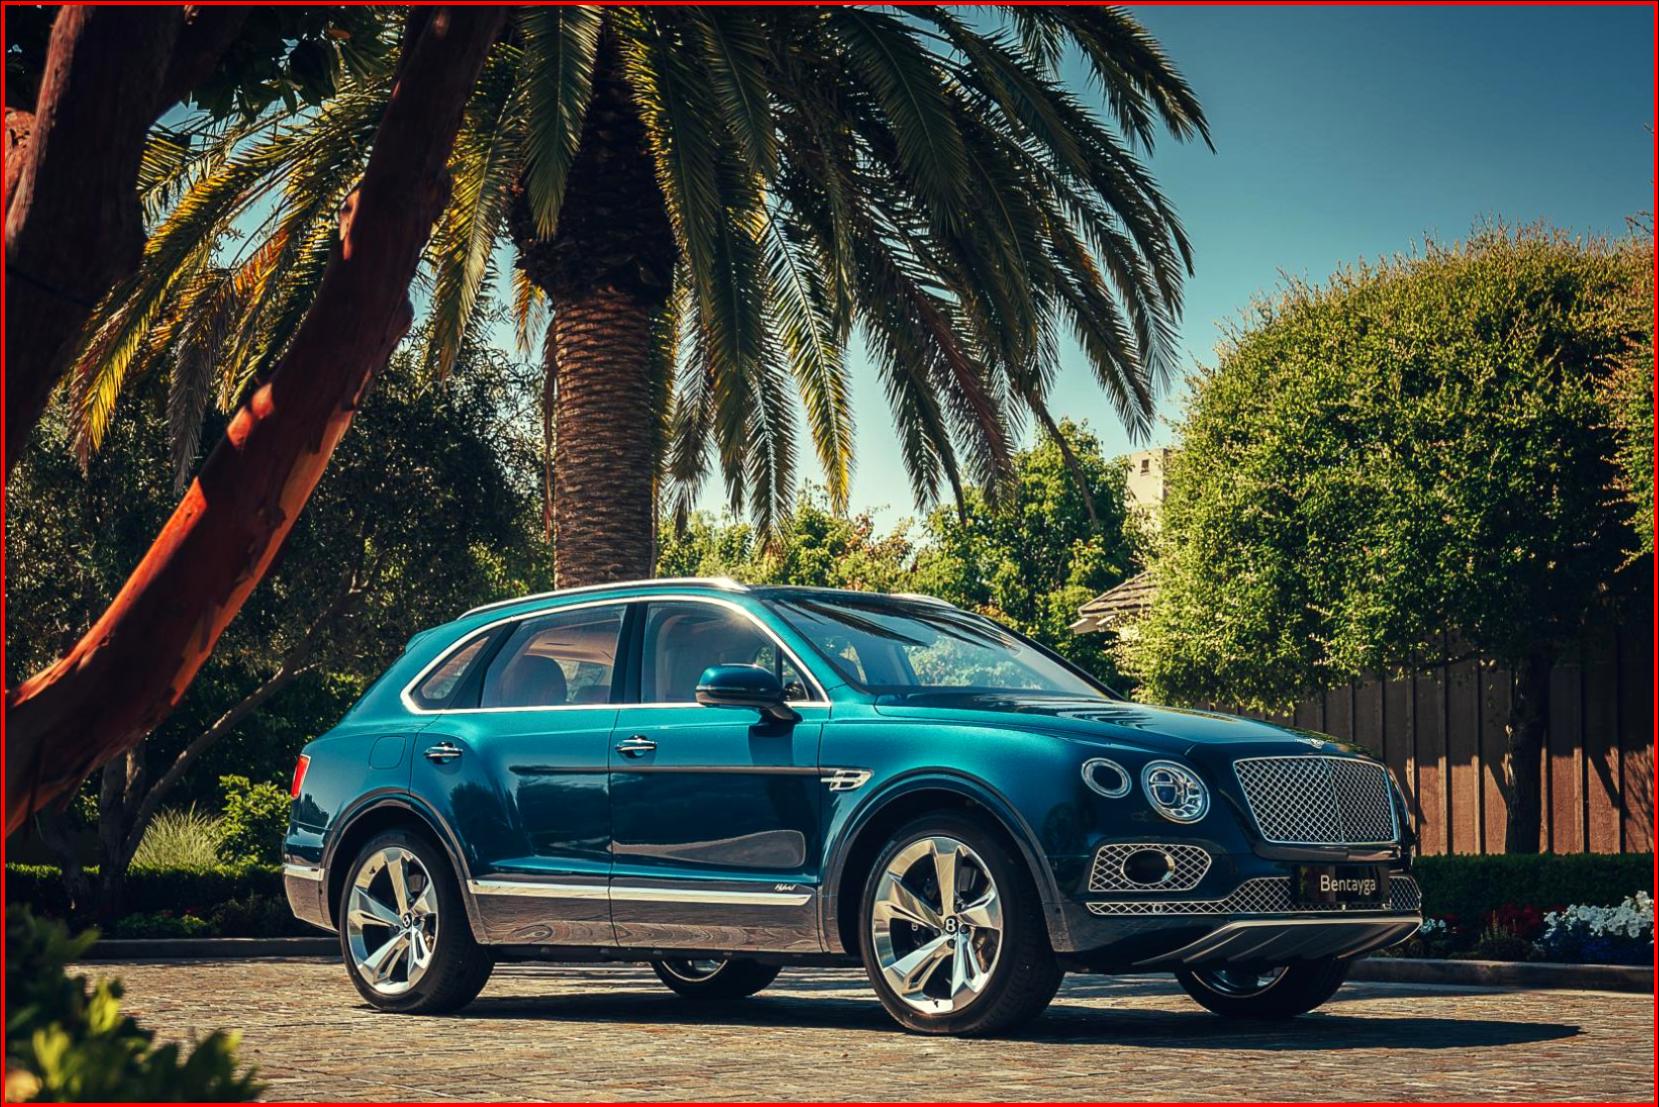 AutoInformed.com on Bentley Bentayga Hybrid